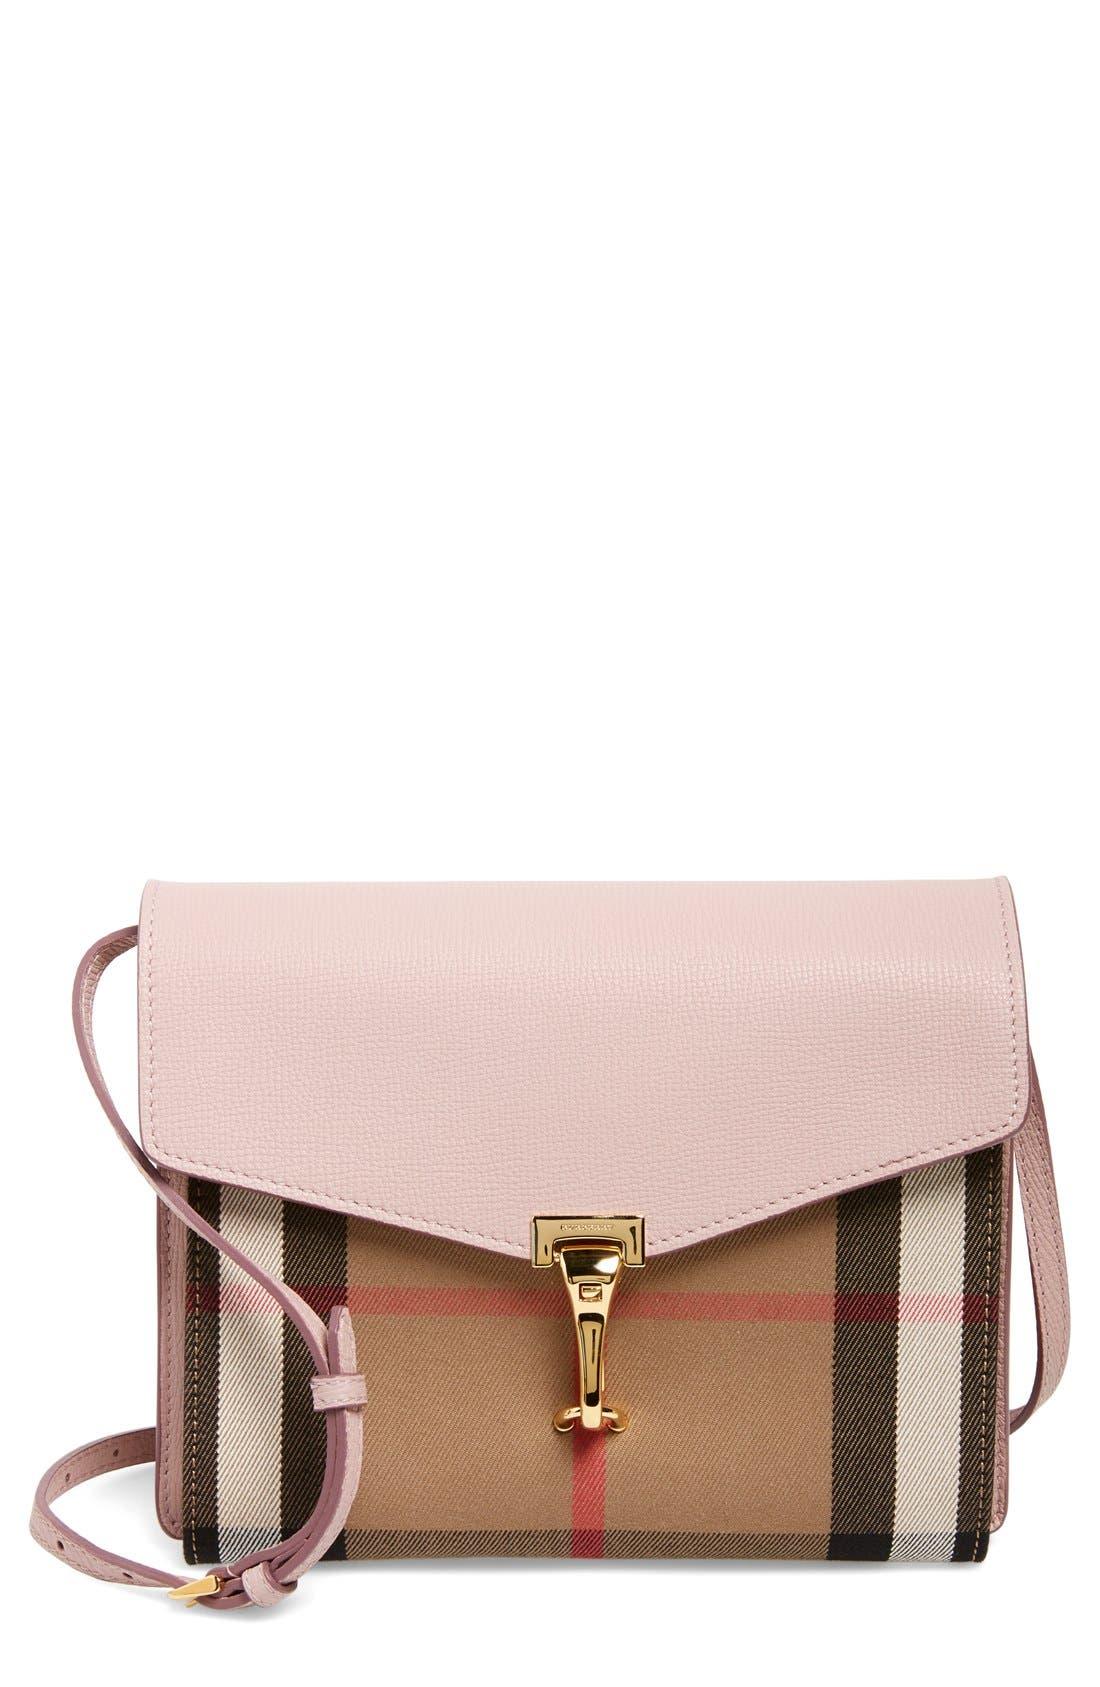 burberry bag small